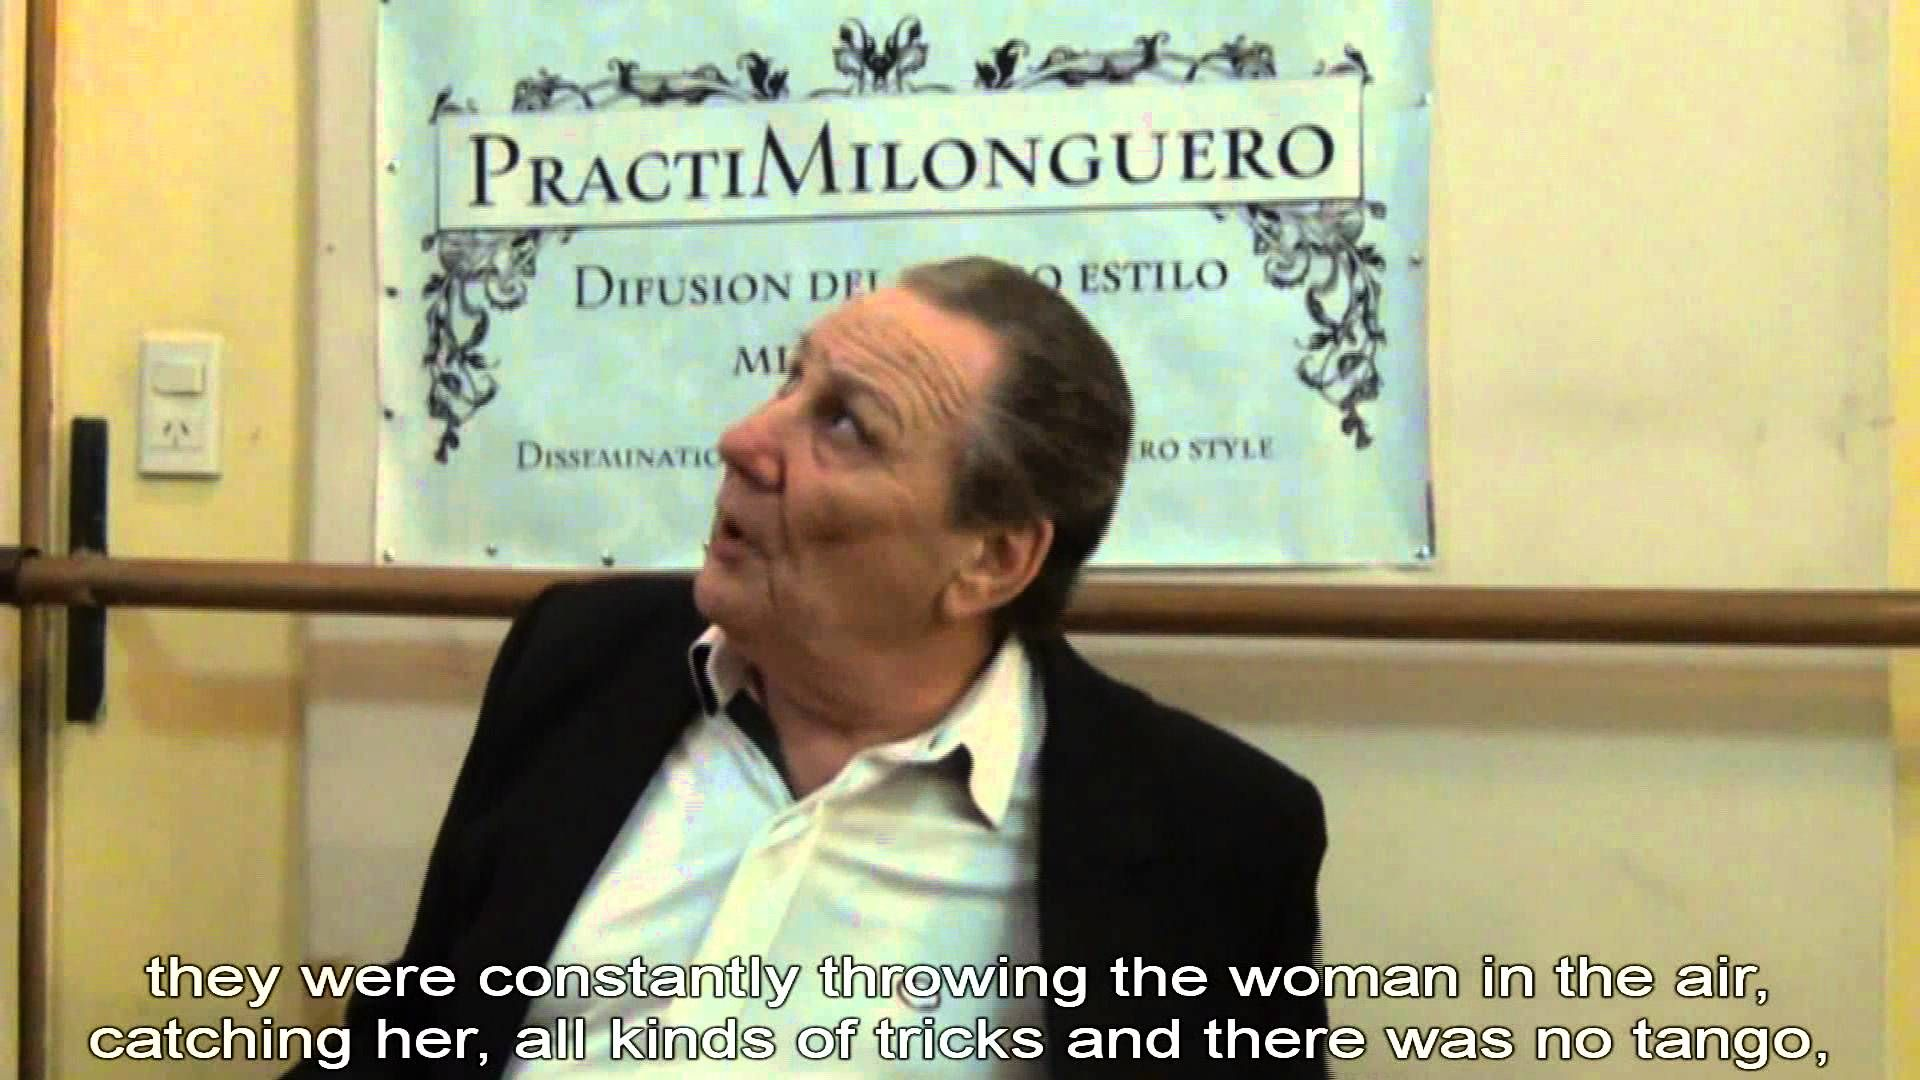 PractiMilonguero Presents Jorge Manganelli